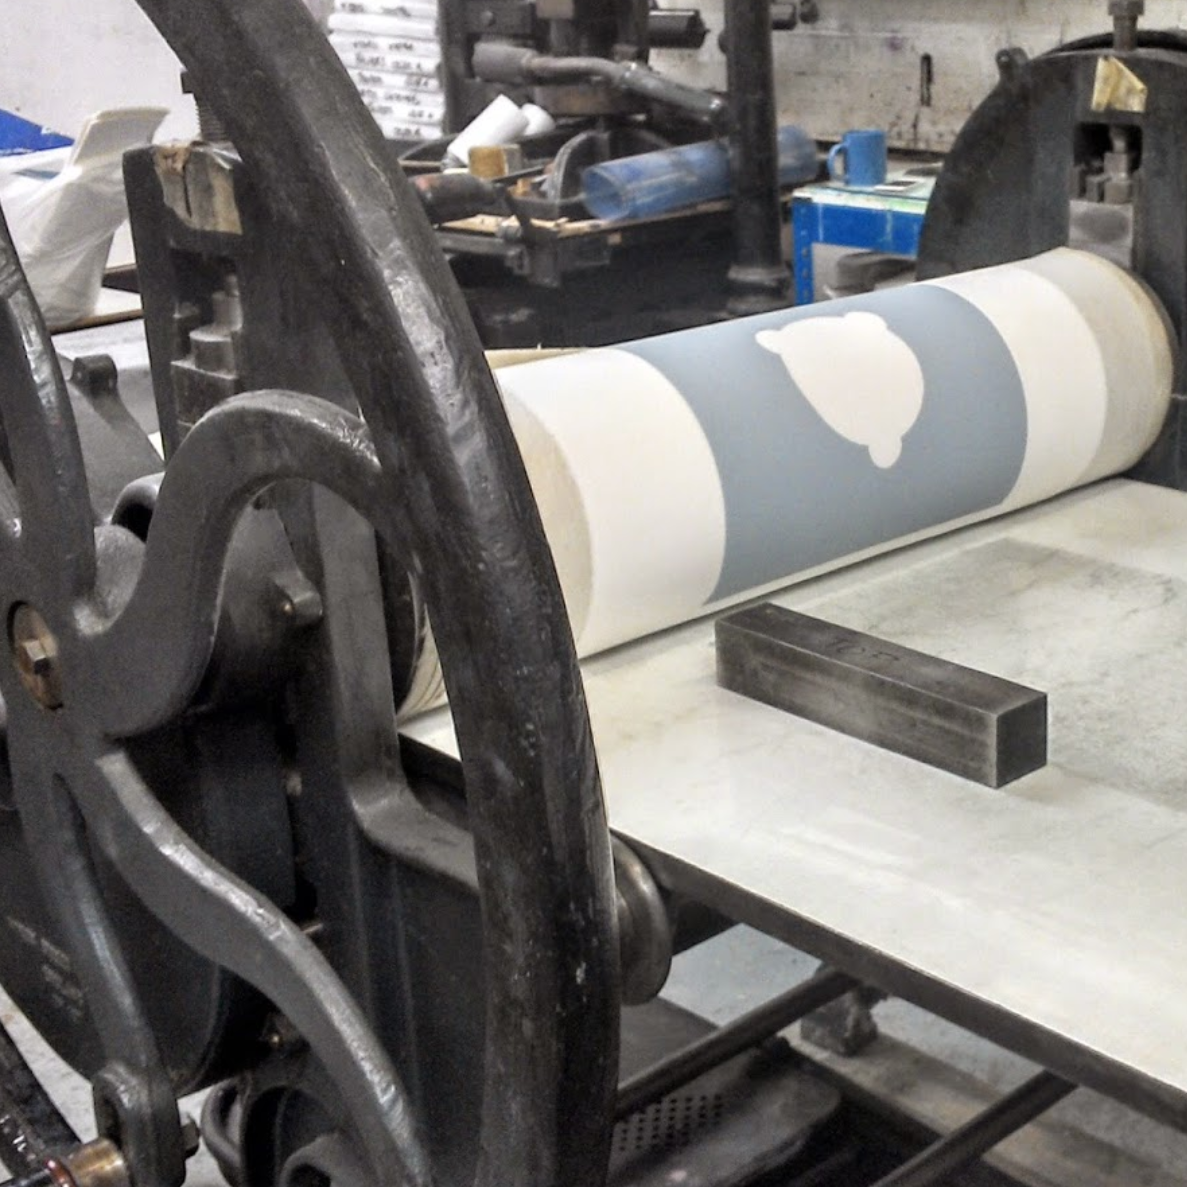 paupers press printmaking london hoxton